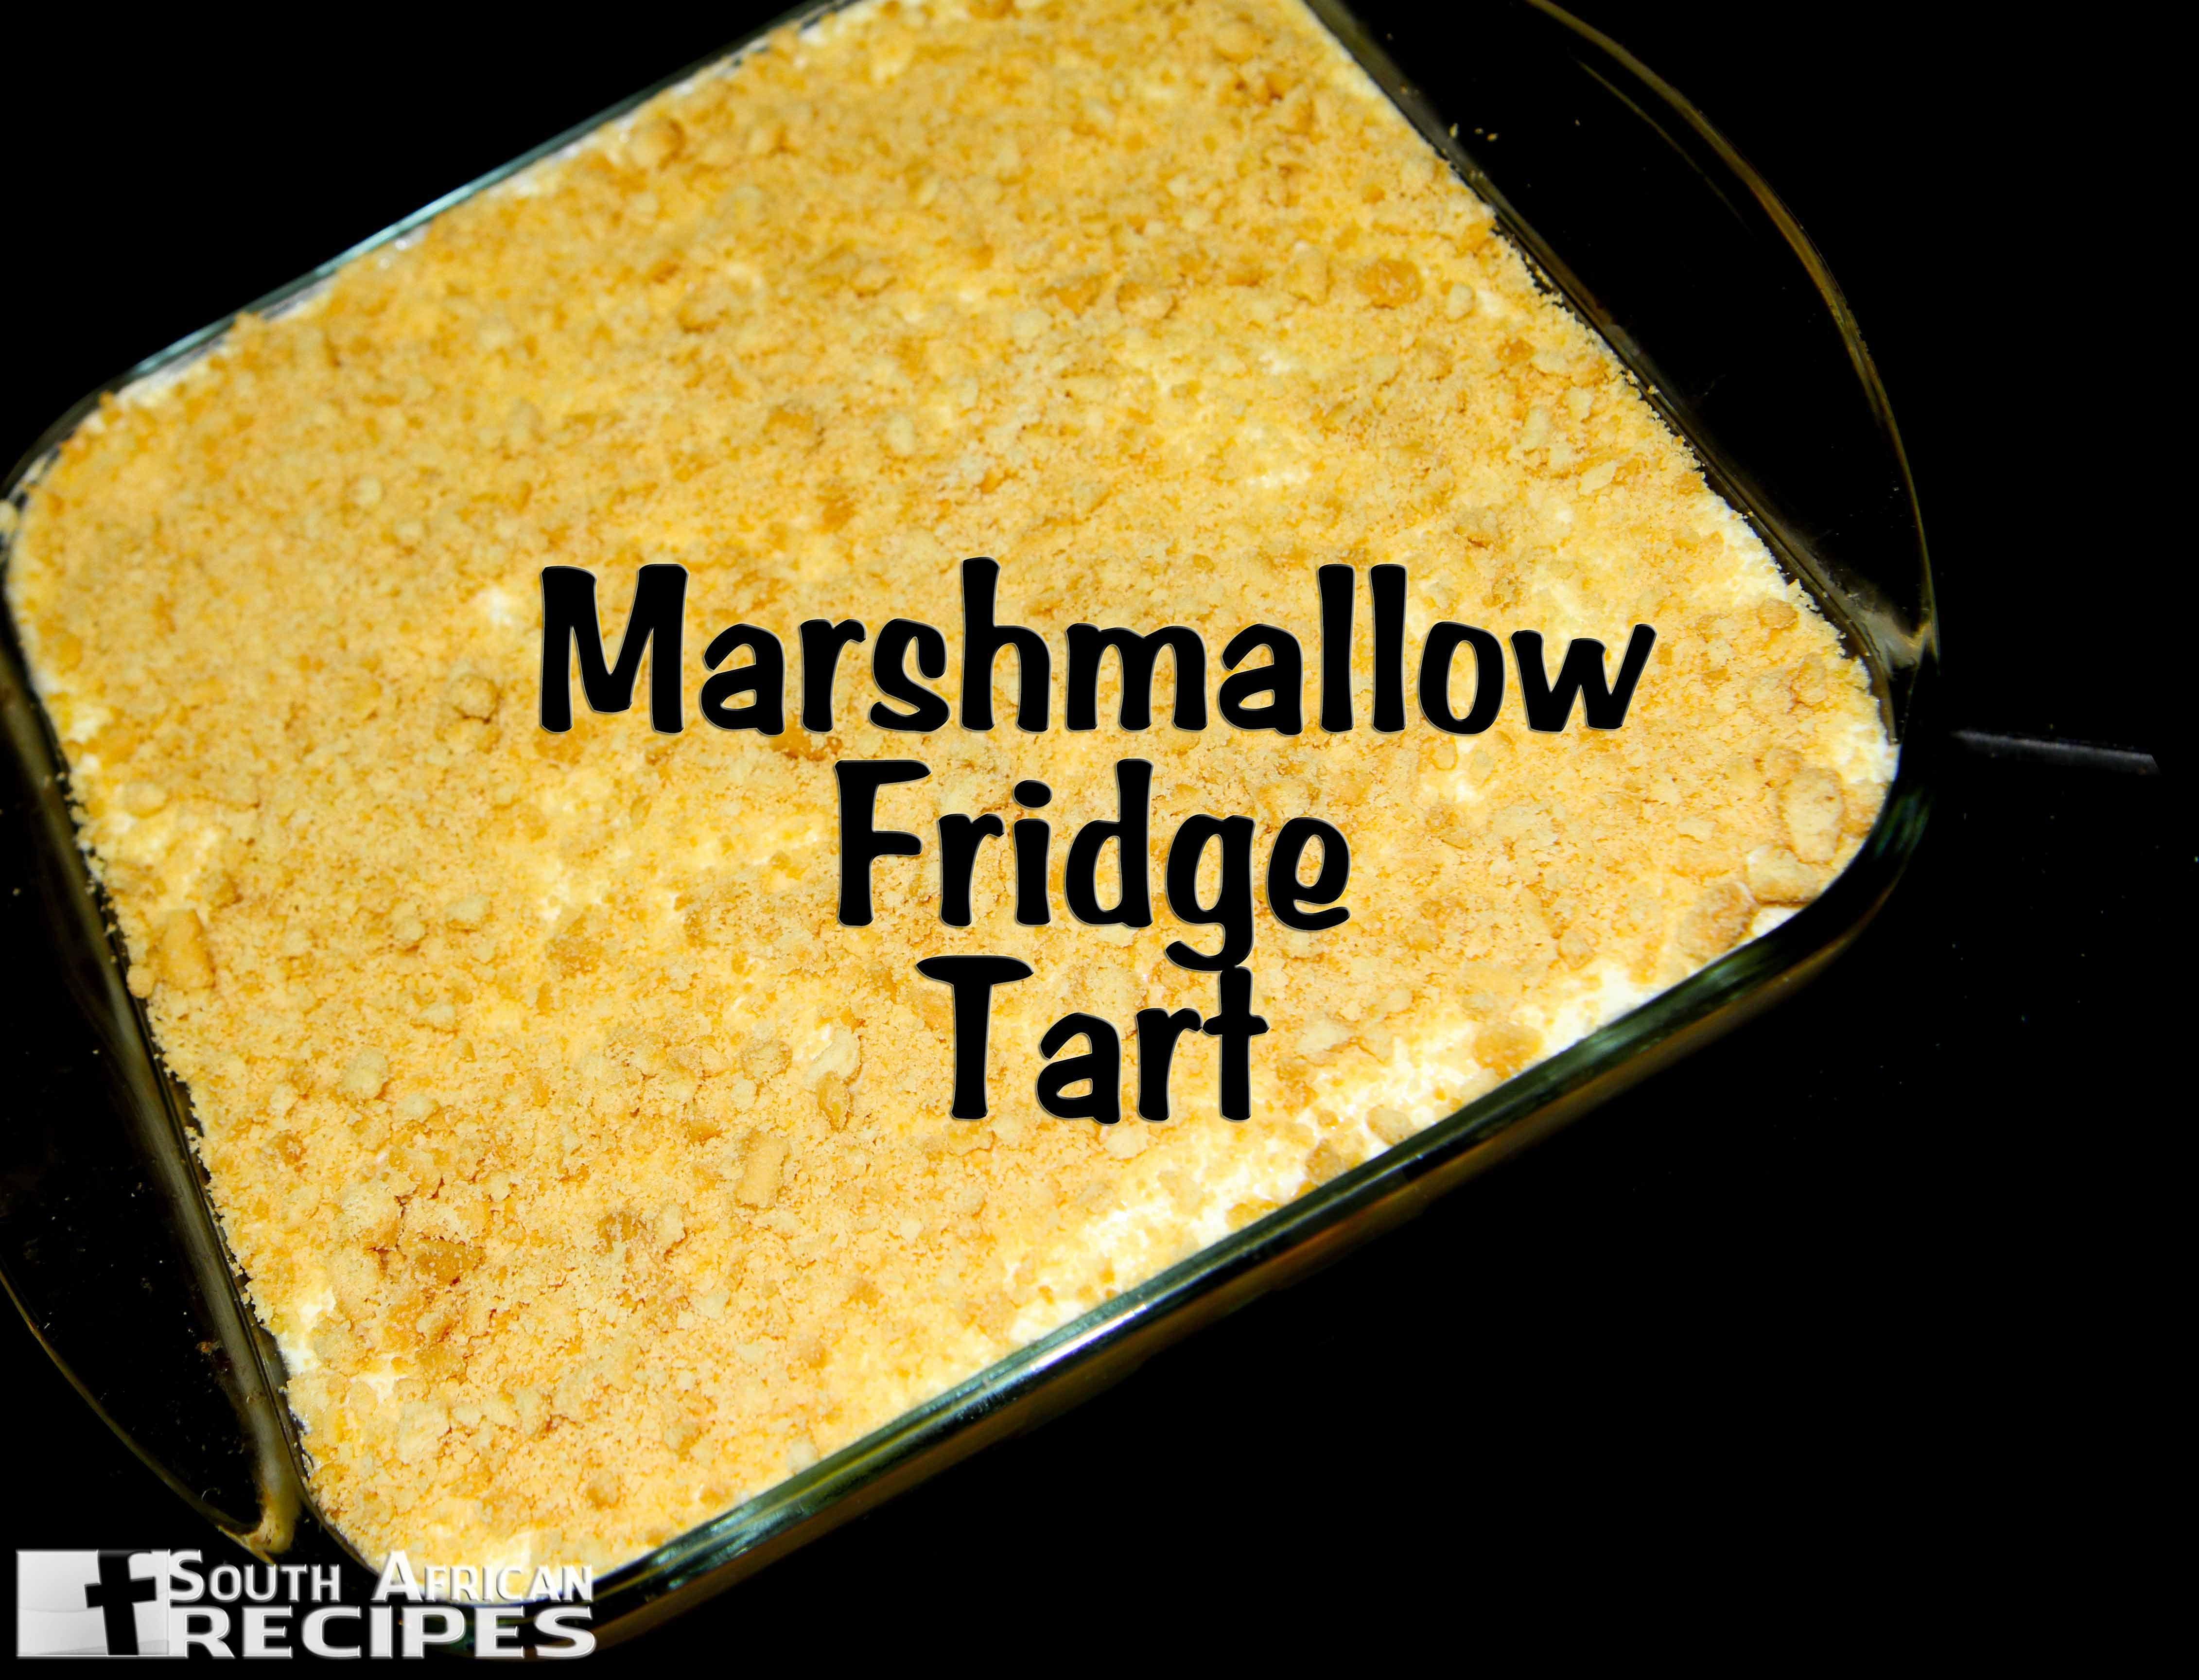 South african recipes marshmallow fridge tart madeleine 15 south african recipes marshmallow fridge tart madeleine forumfinder Image collections